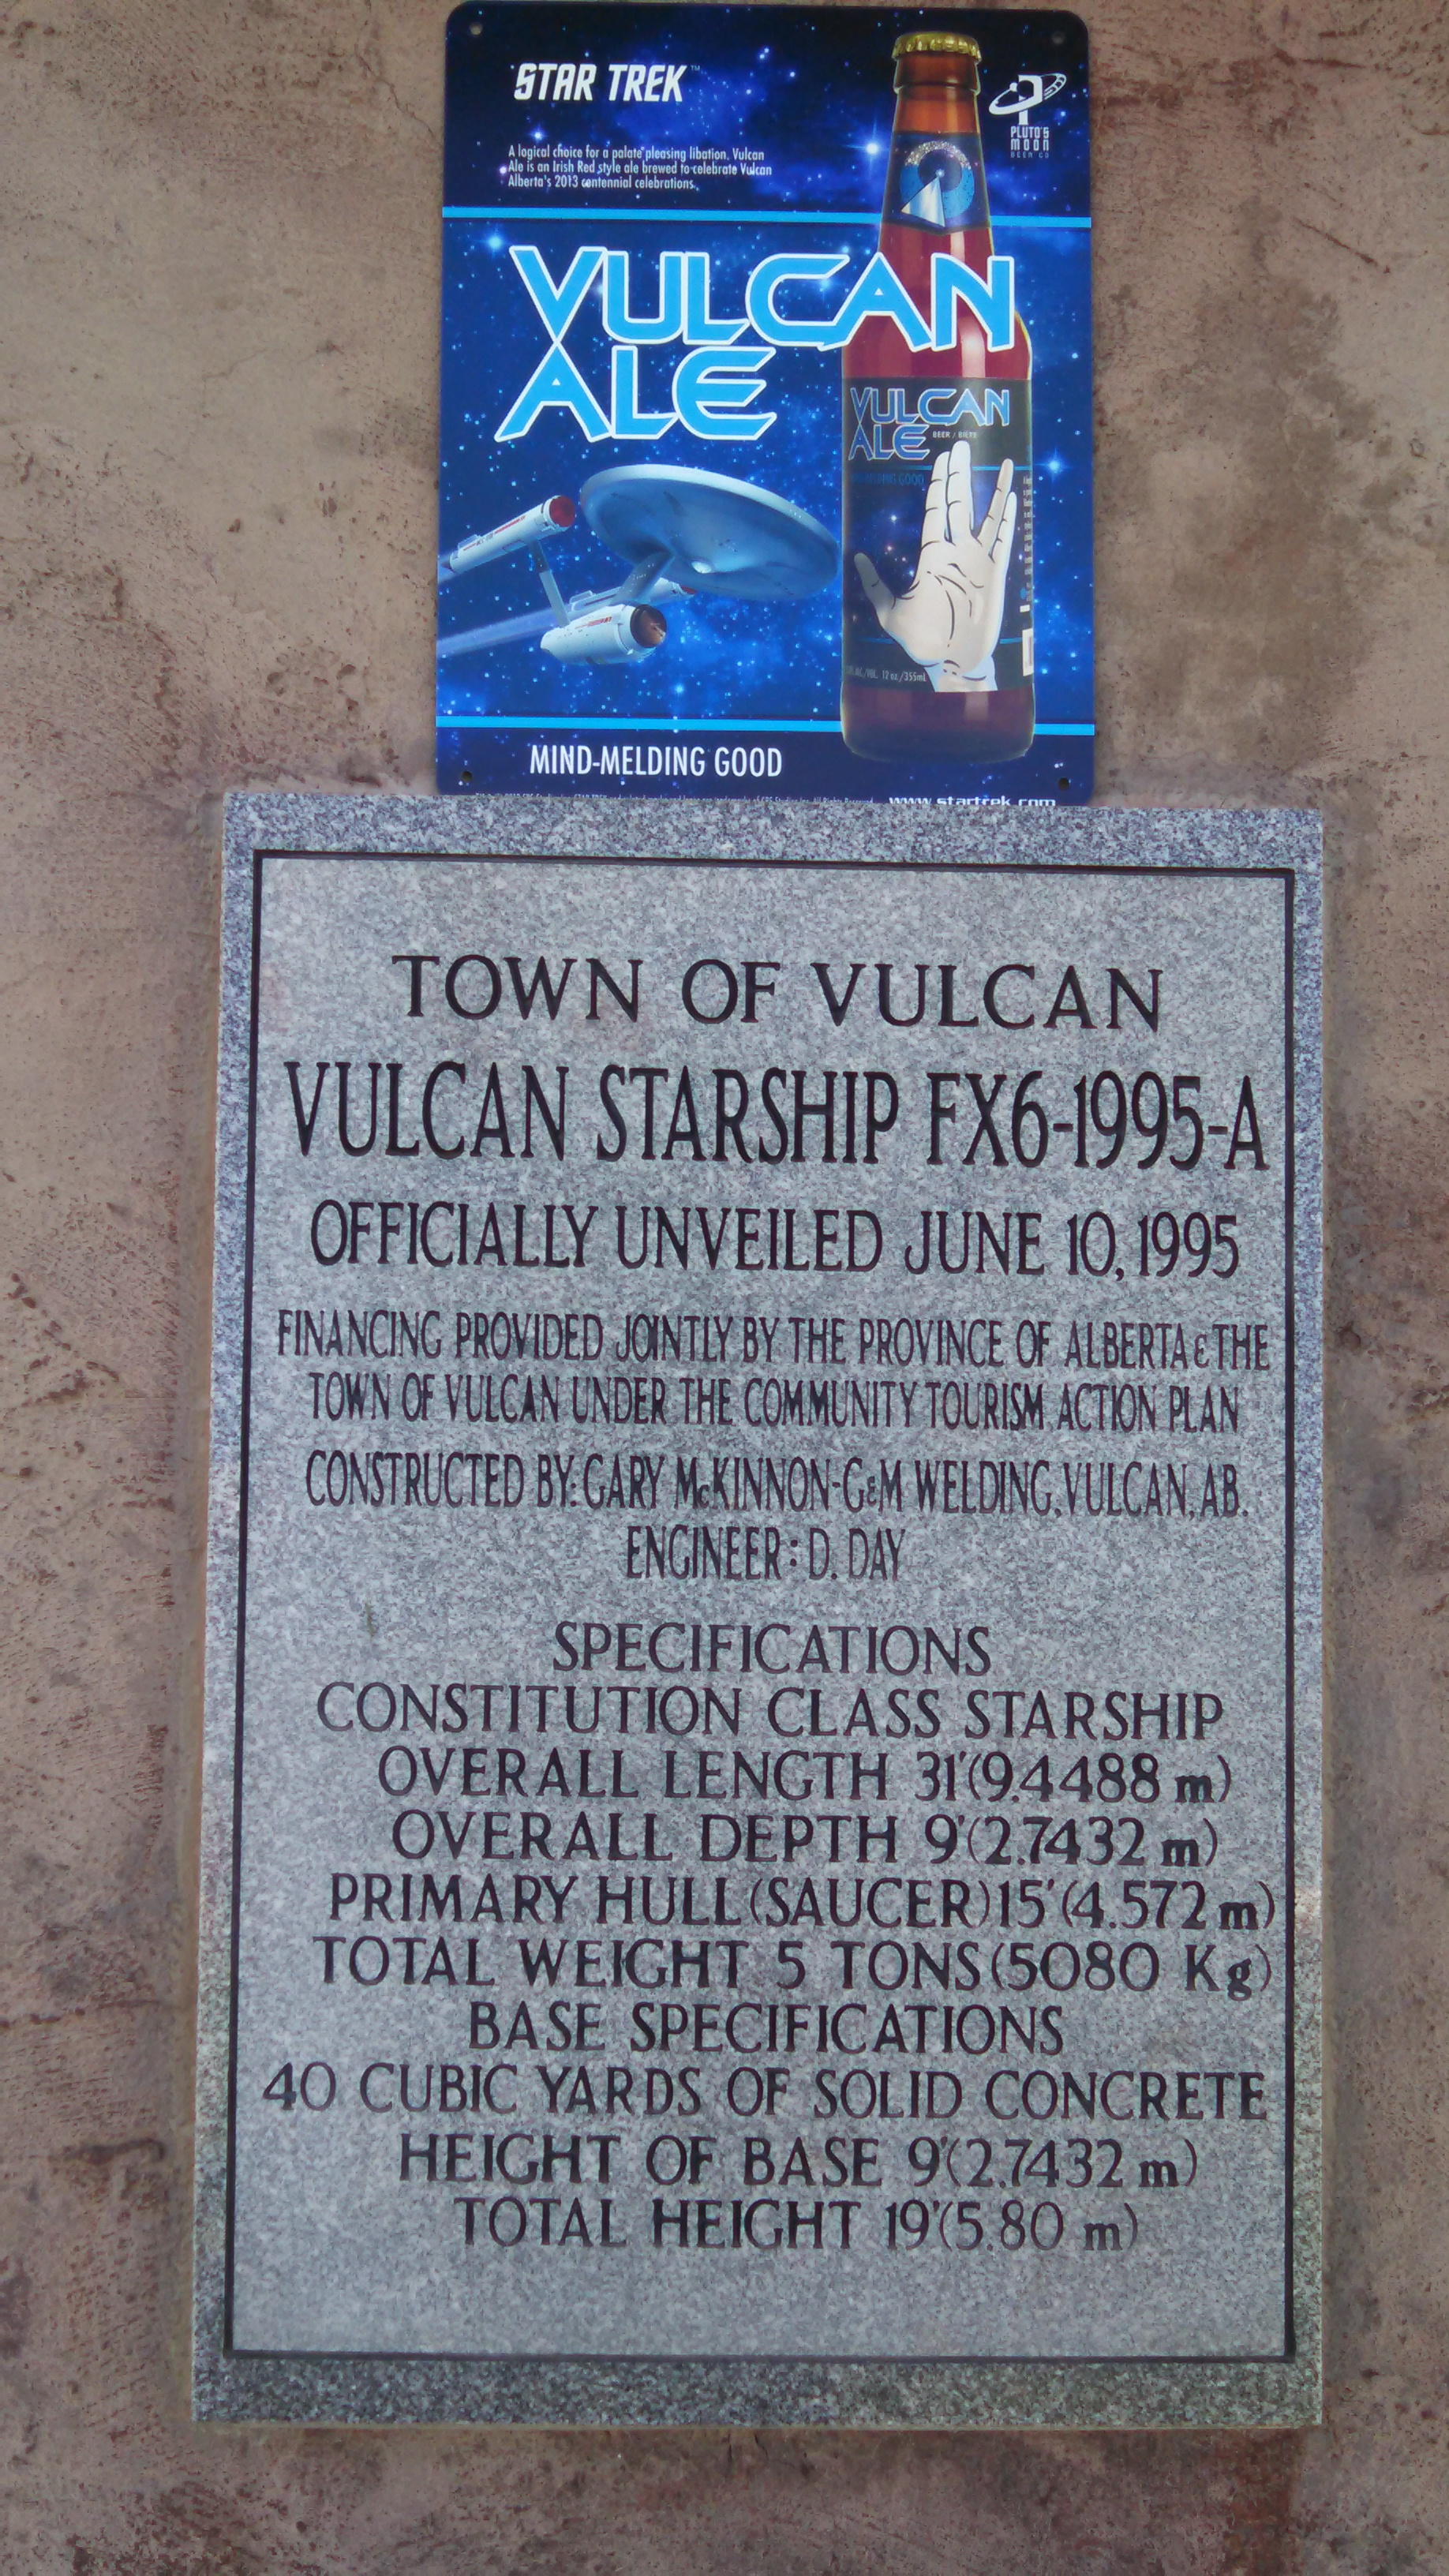 @VulcanTourism